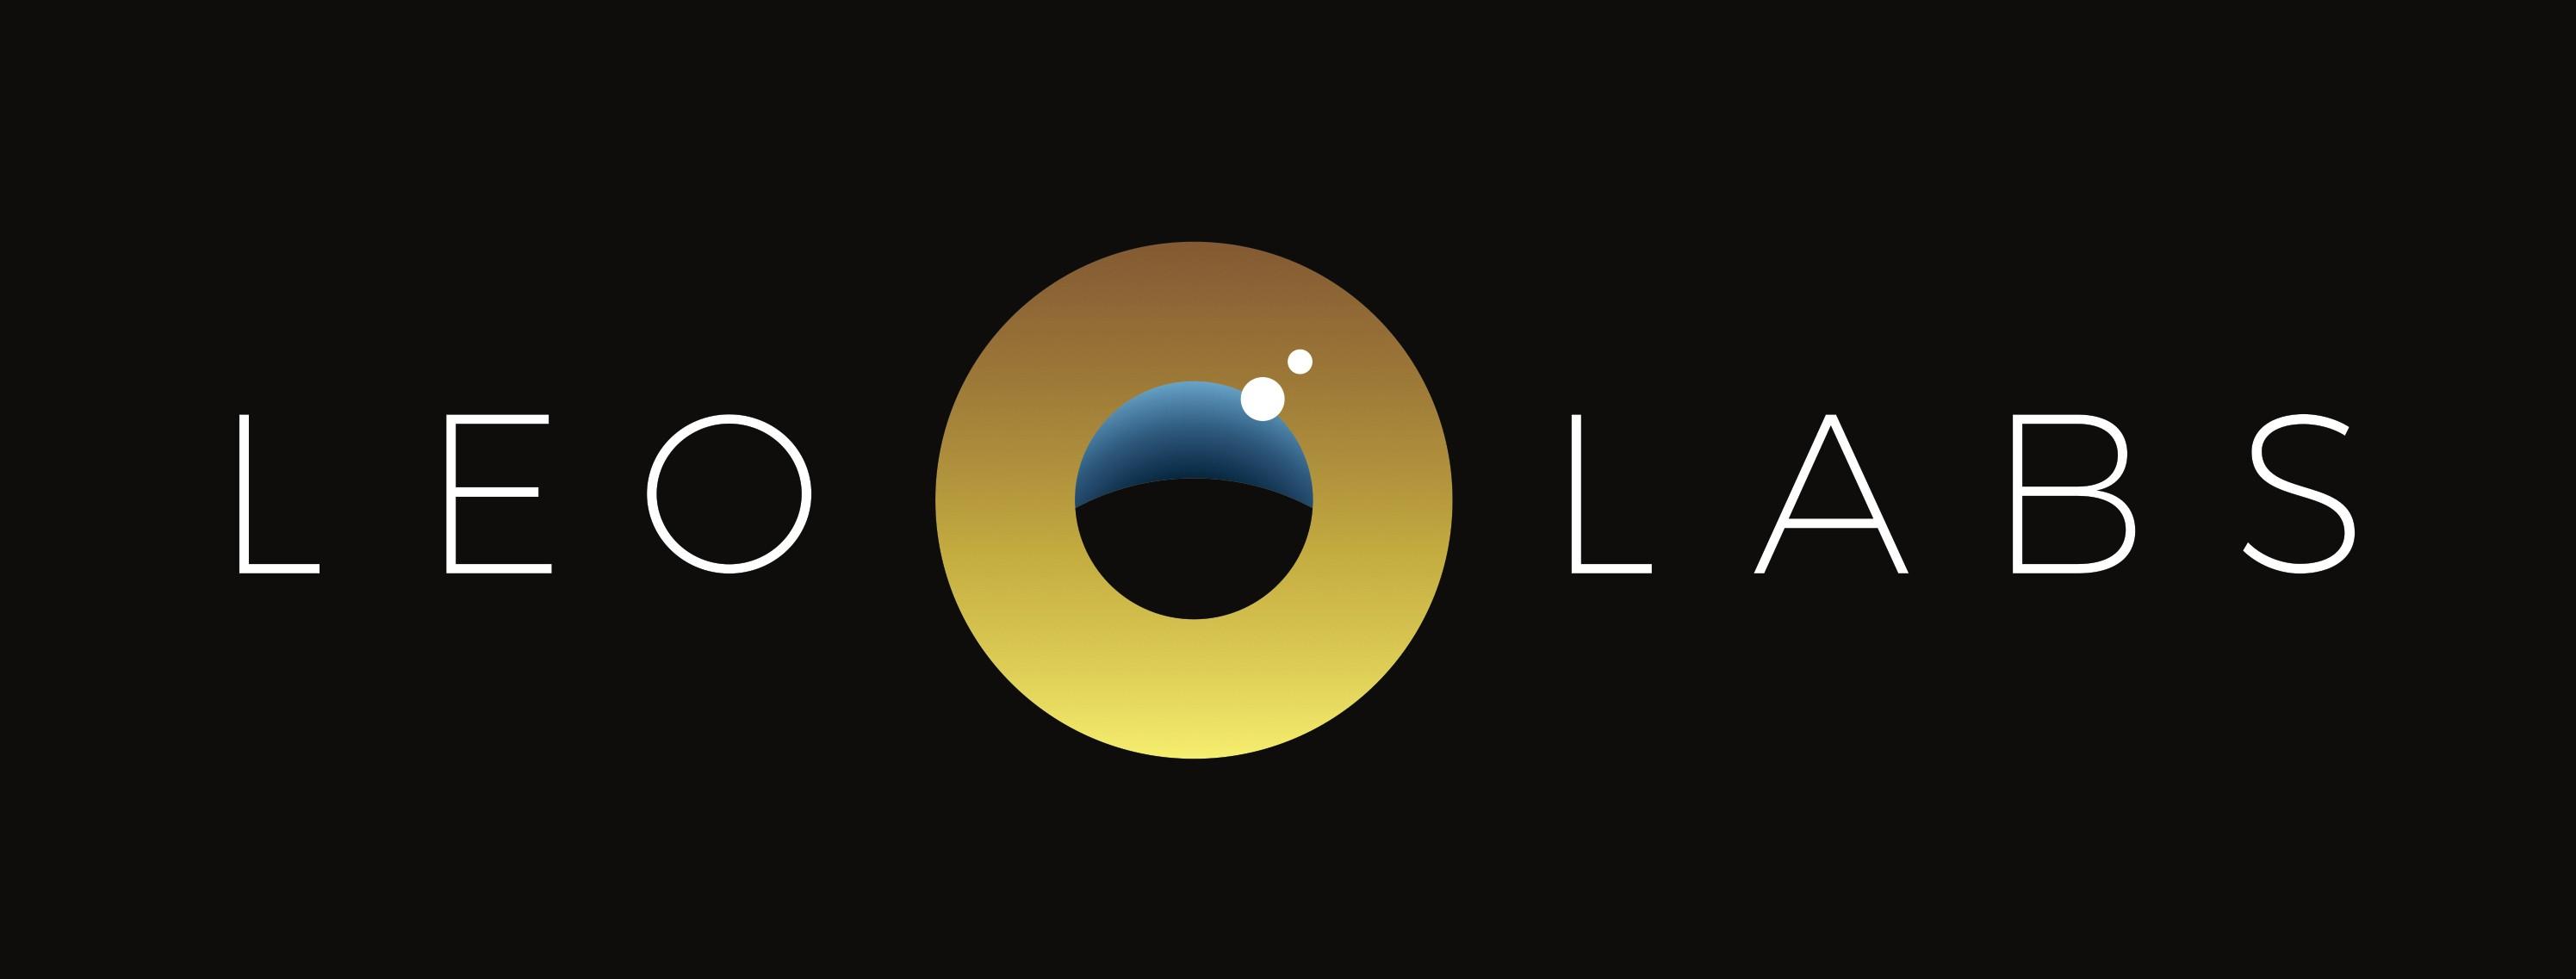 LeoLabs, Inc    LinkedIn